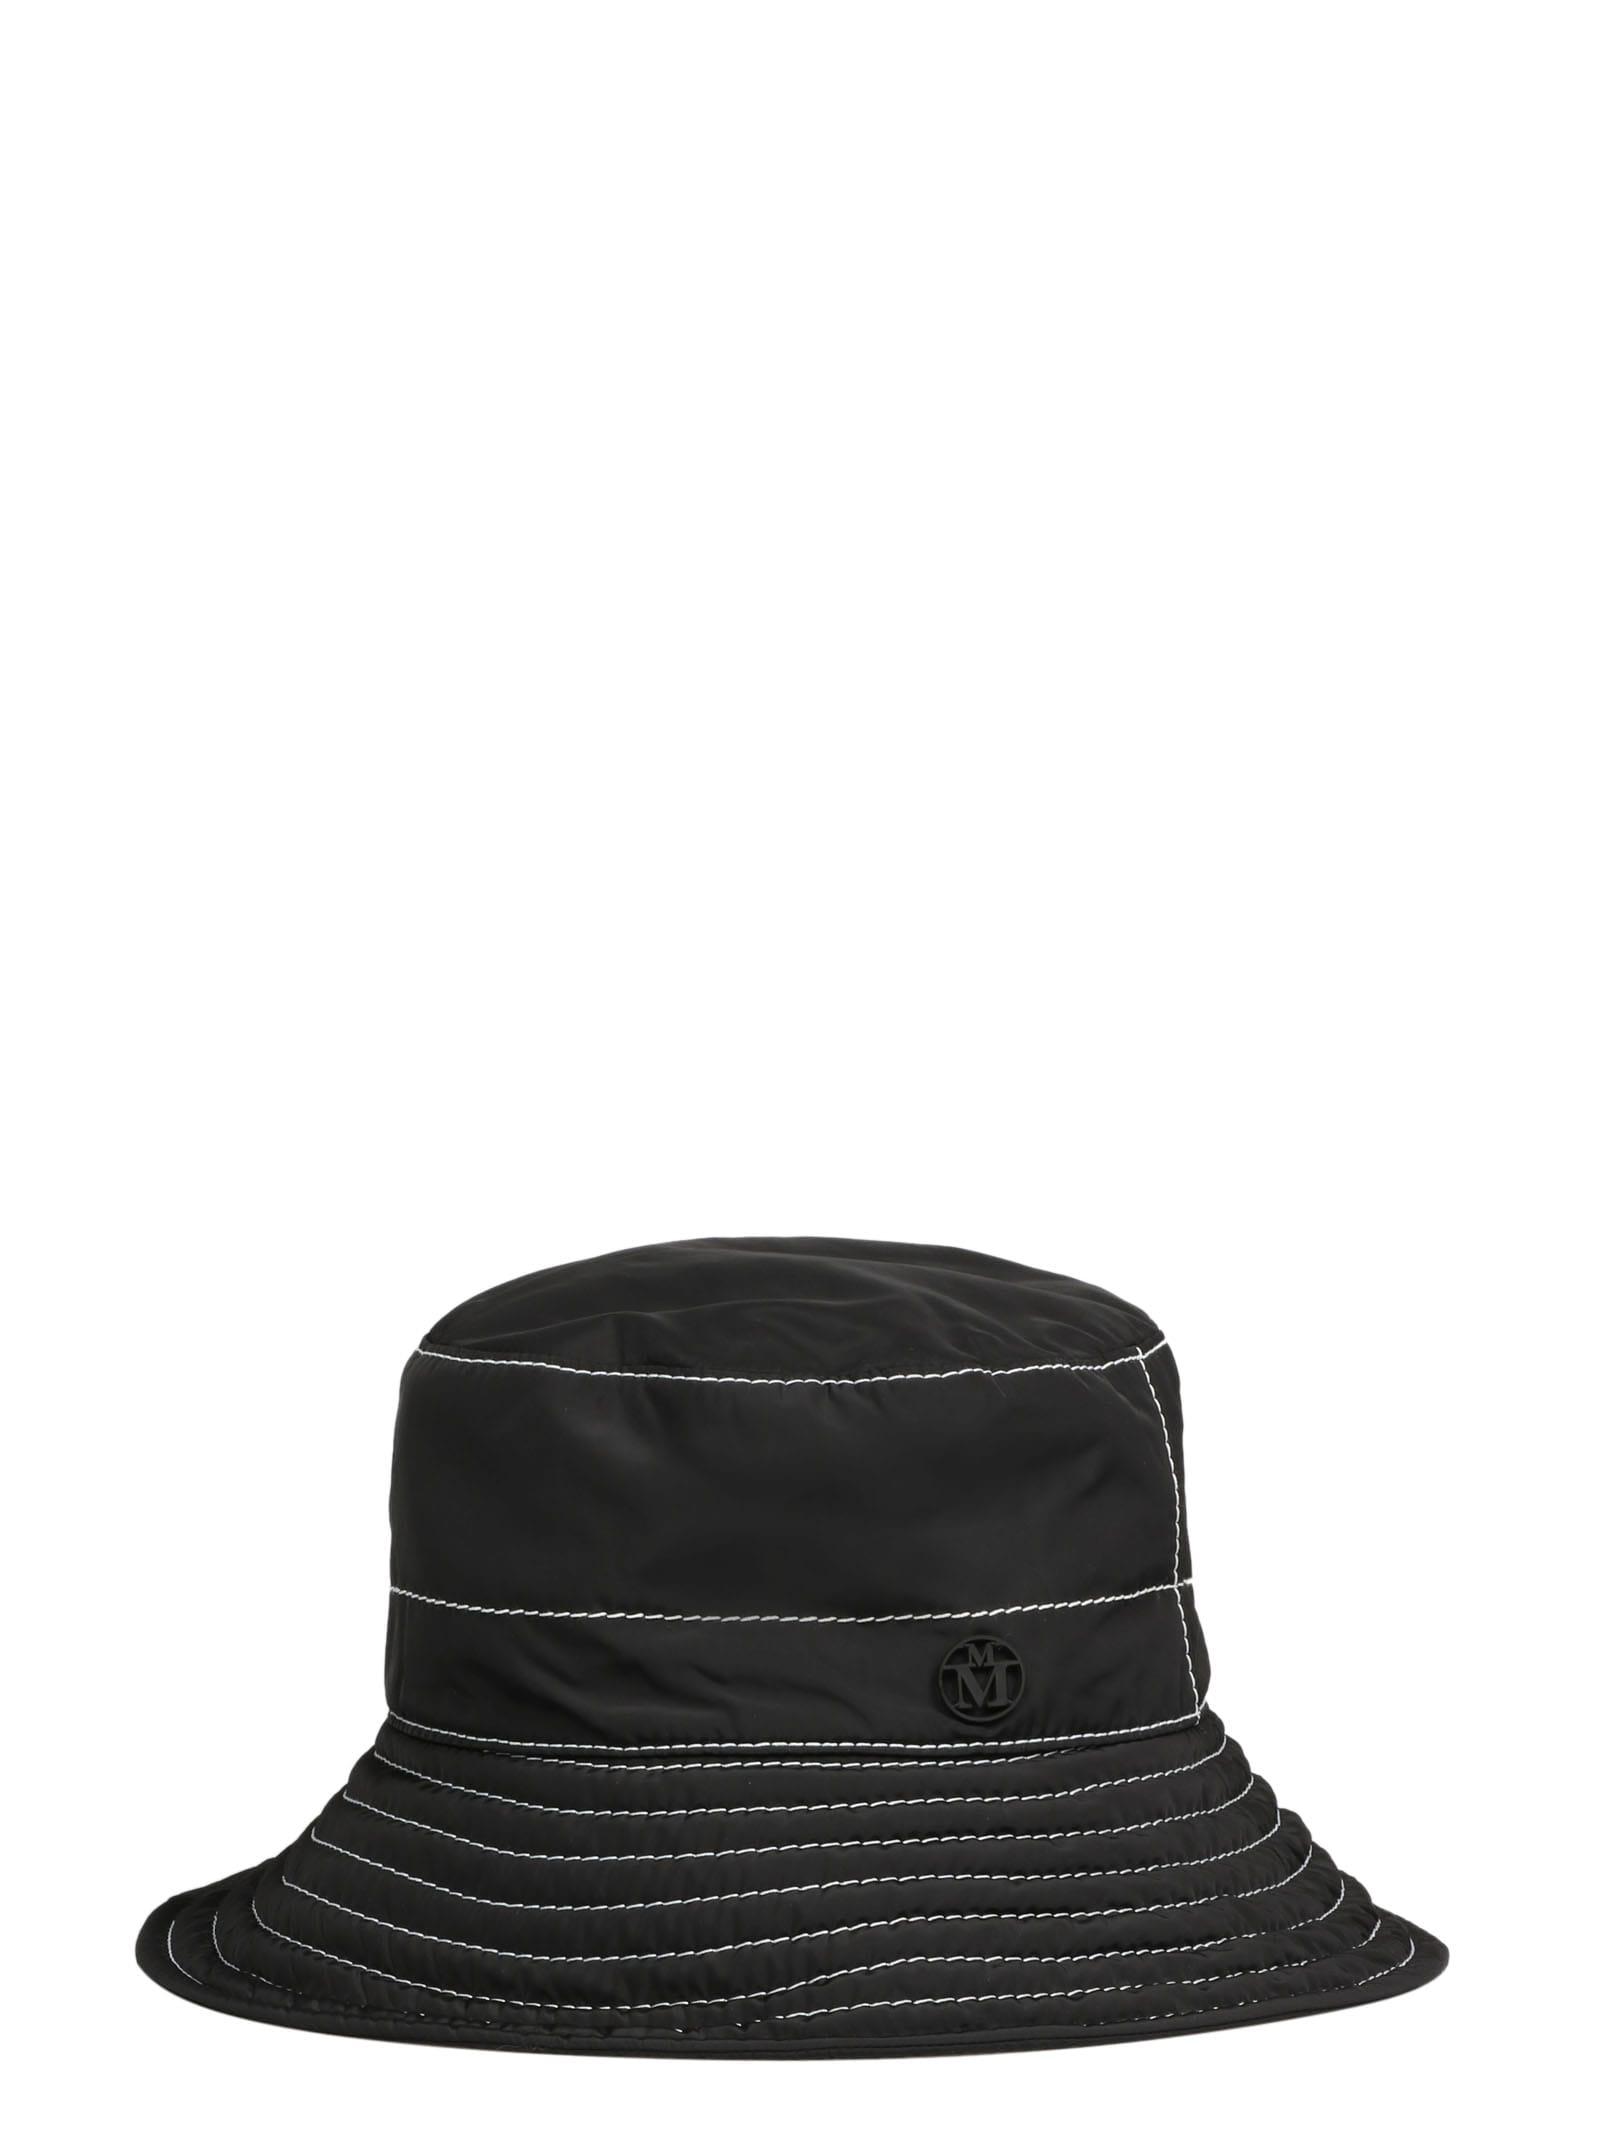 Maison Michel Hats CHARLOTTE 20PF TOPSTITCHED